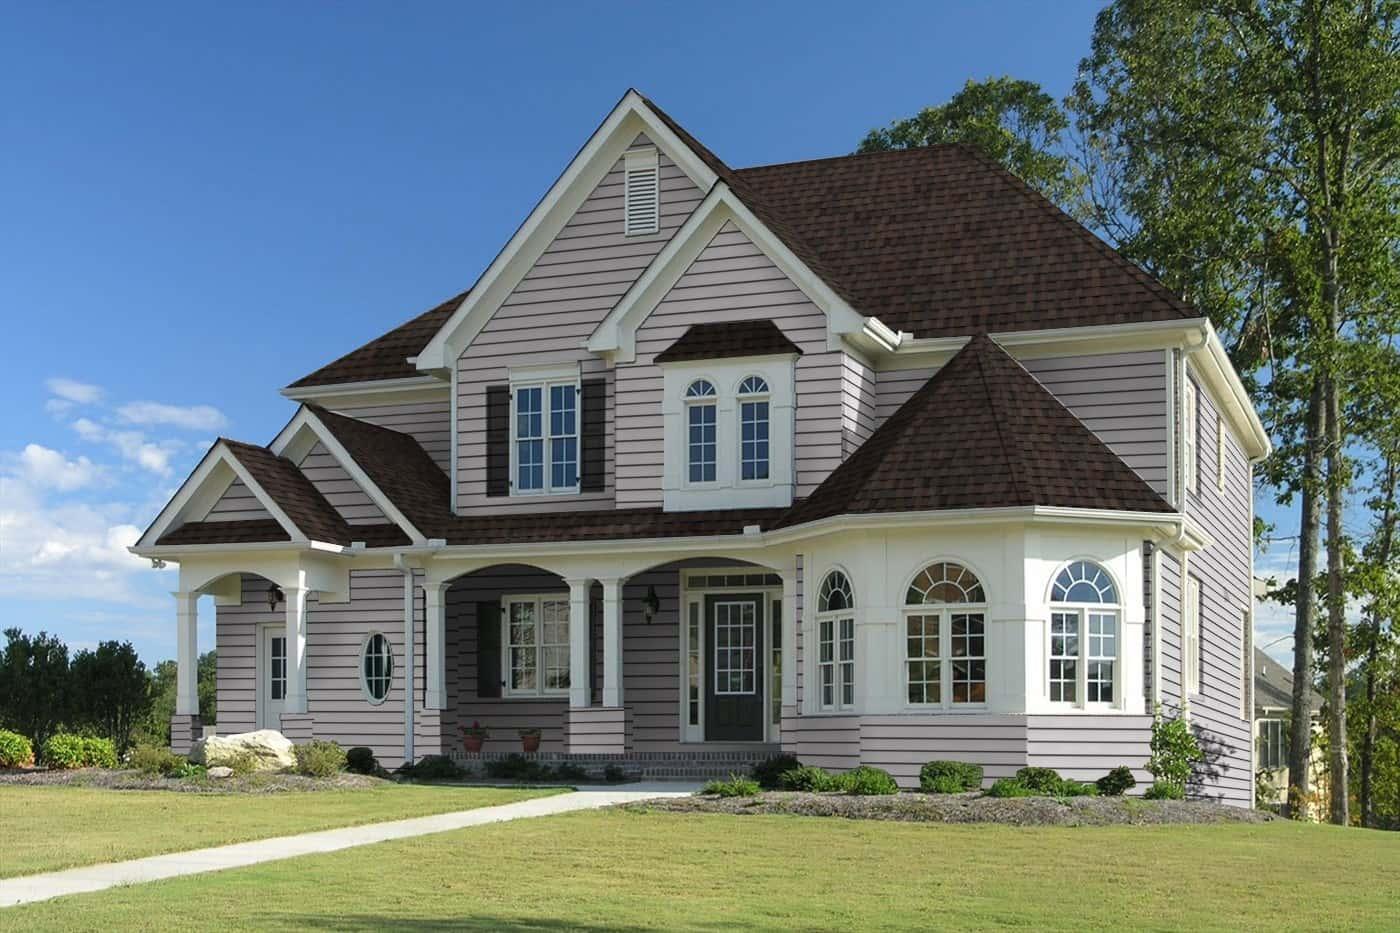 TAMKO Heritage Premium Rustic Brown House